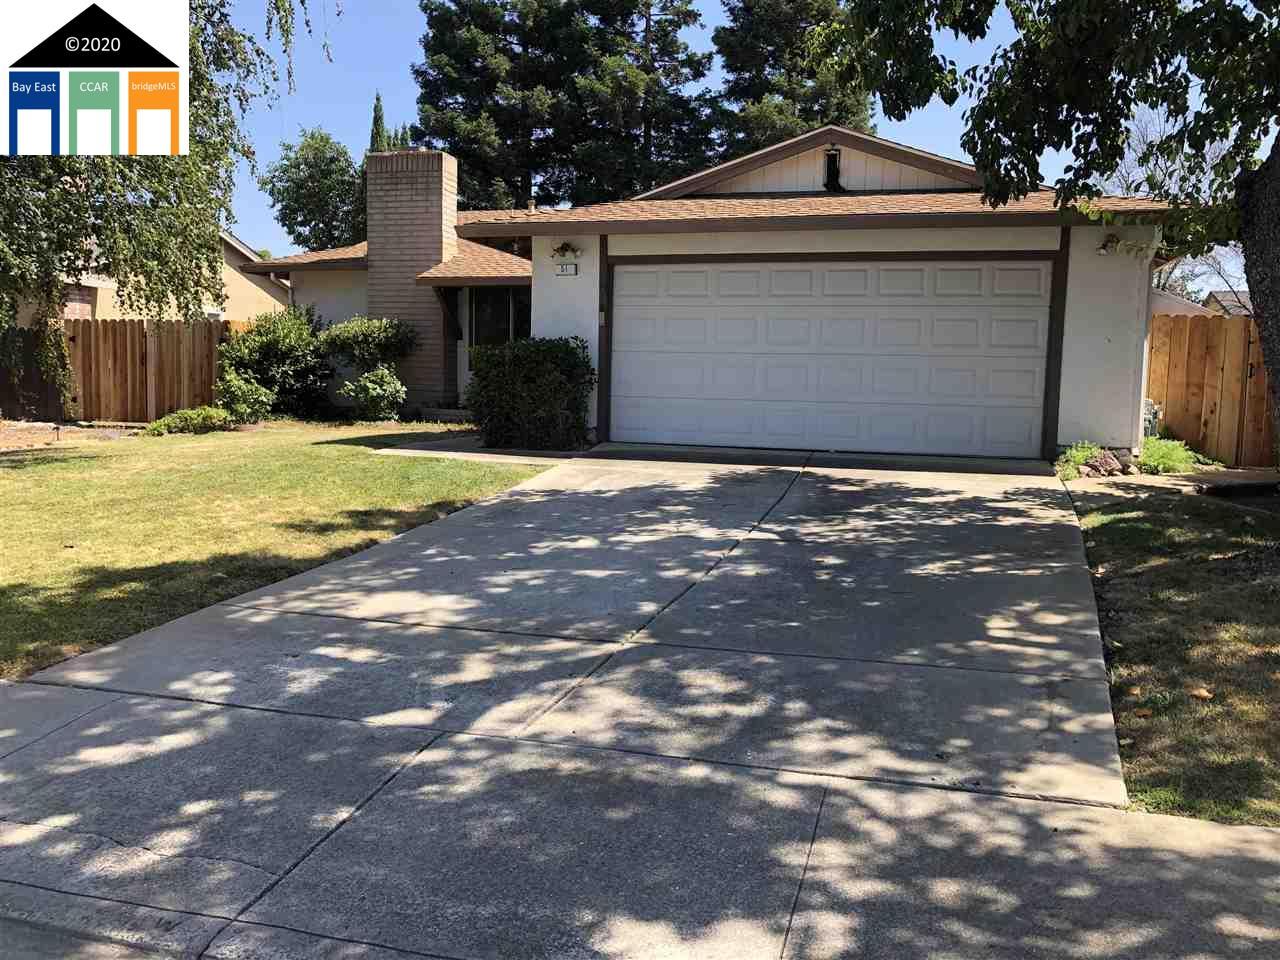 51 Cloverleaf, BRENTWOOD, CA 94513